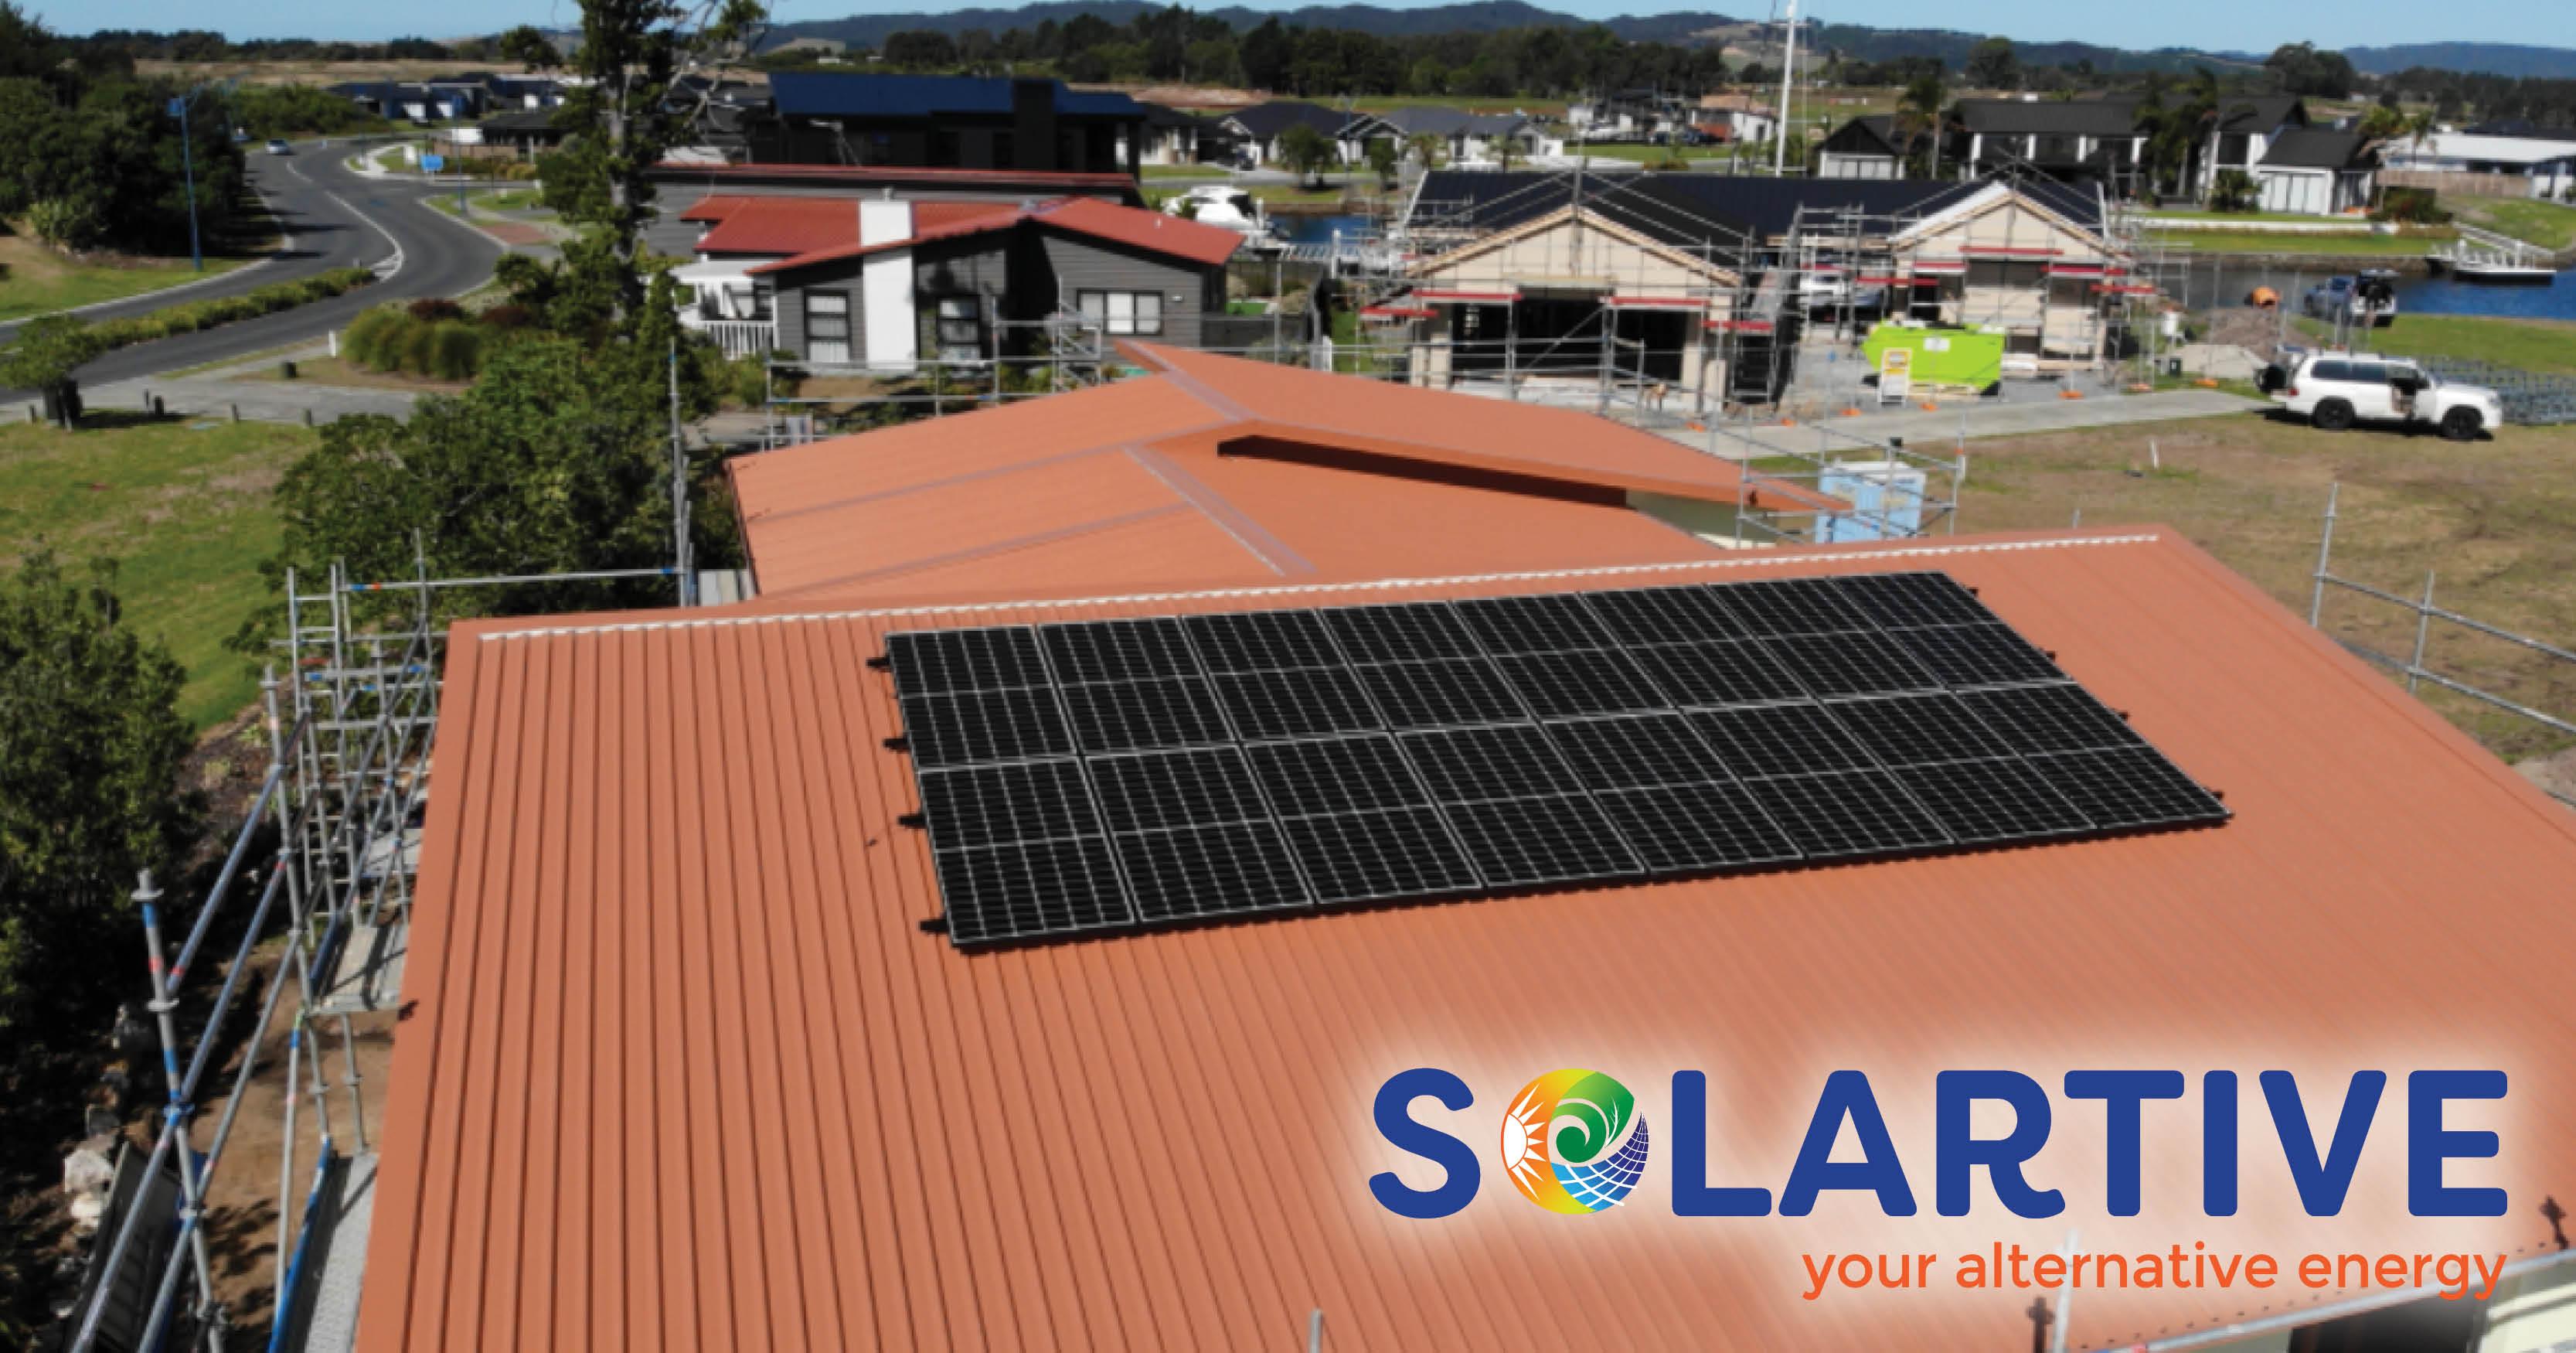 SolartiveImages2